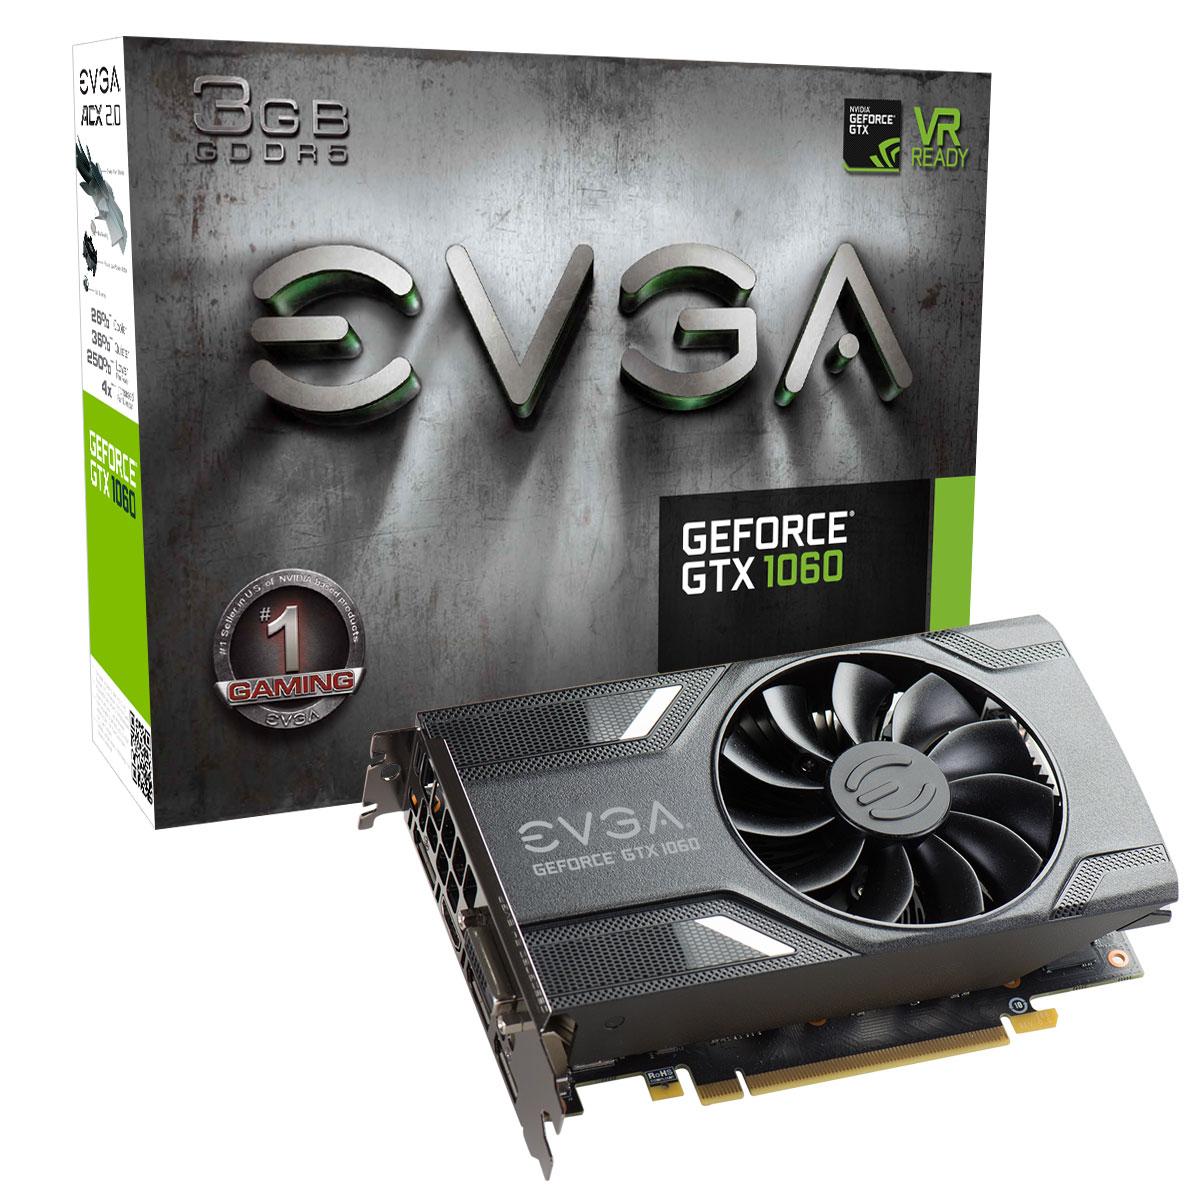 Placa de Vídeo Geforce GTX 1060 3GB DDR5 192Bits 03G-P4-6160-KR - EVGA